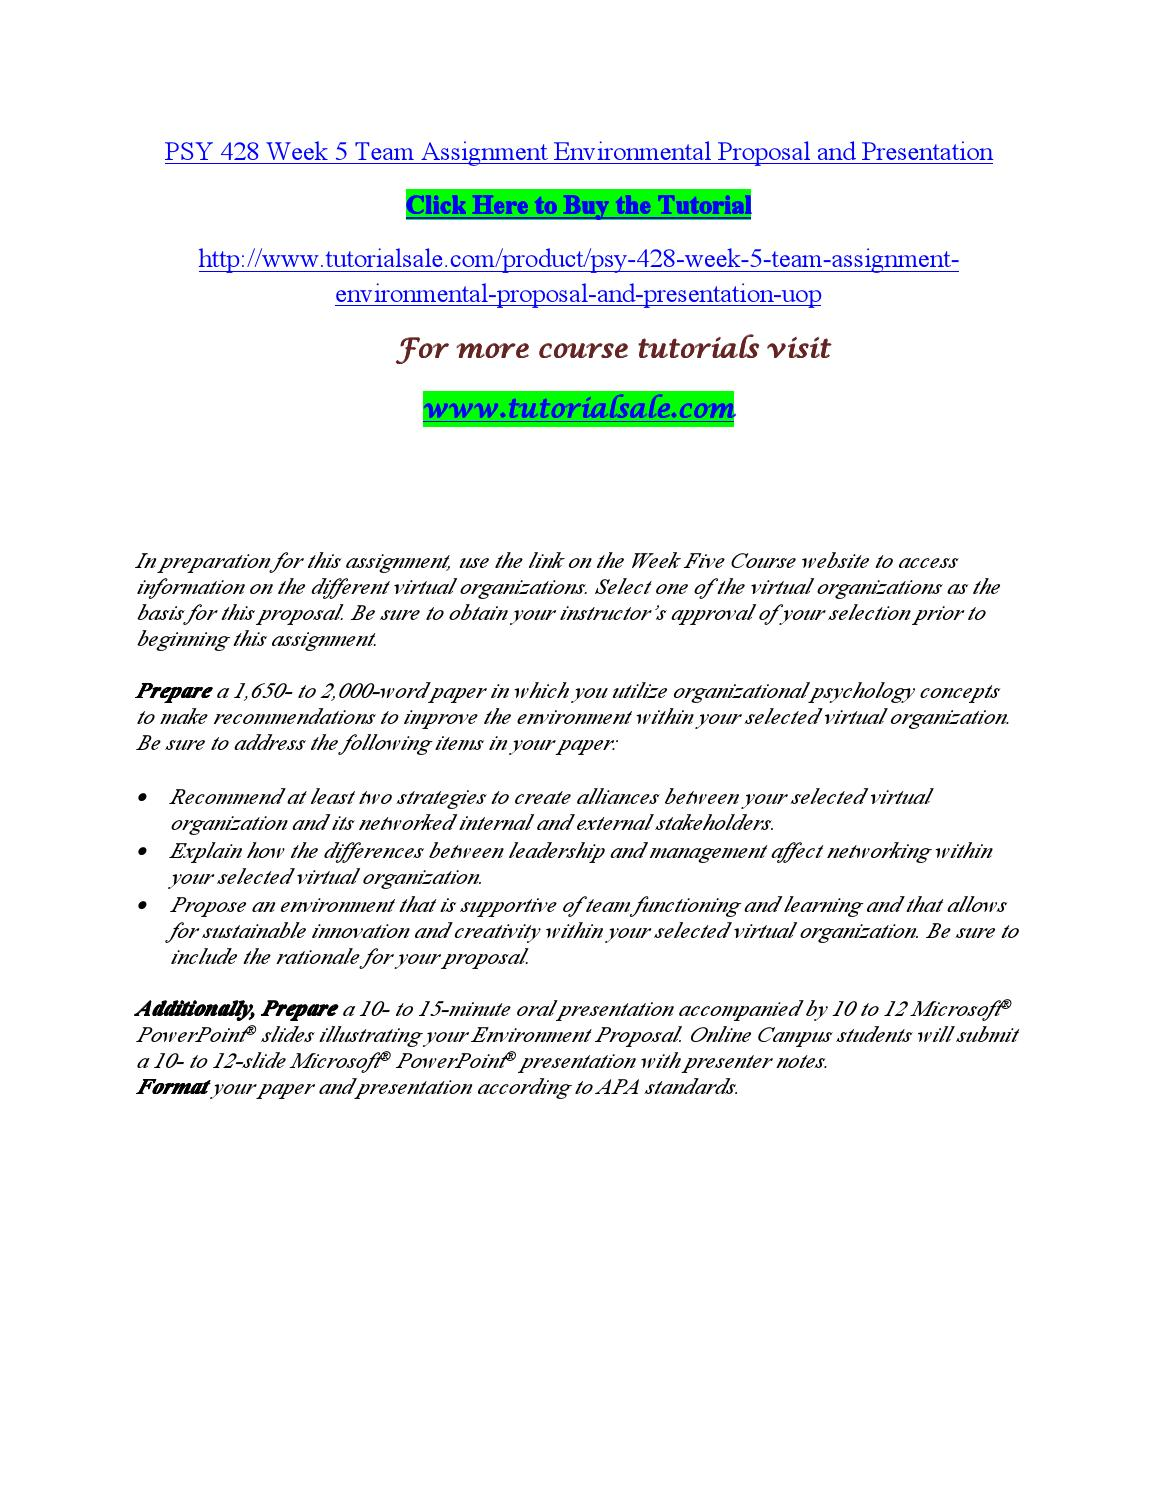 psy 428 week 3 learning team Psy 428 week 3 individual improving organizational performance simulation psy 428 week 3 learning team job satisfaction paper psy 428 week 3 summary.